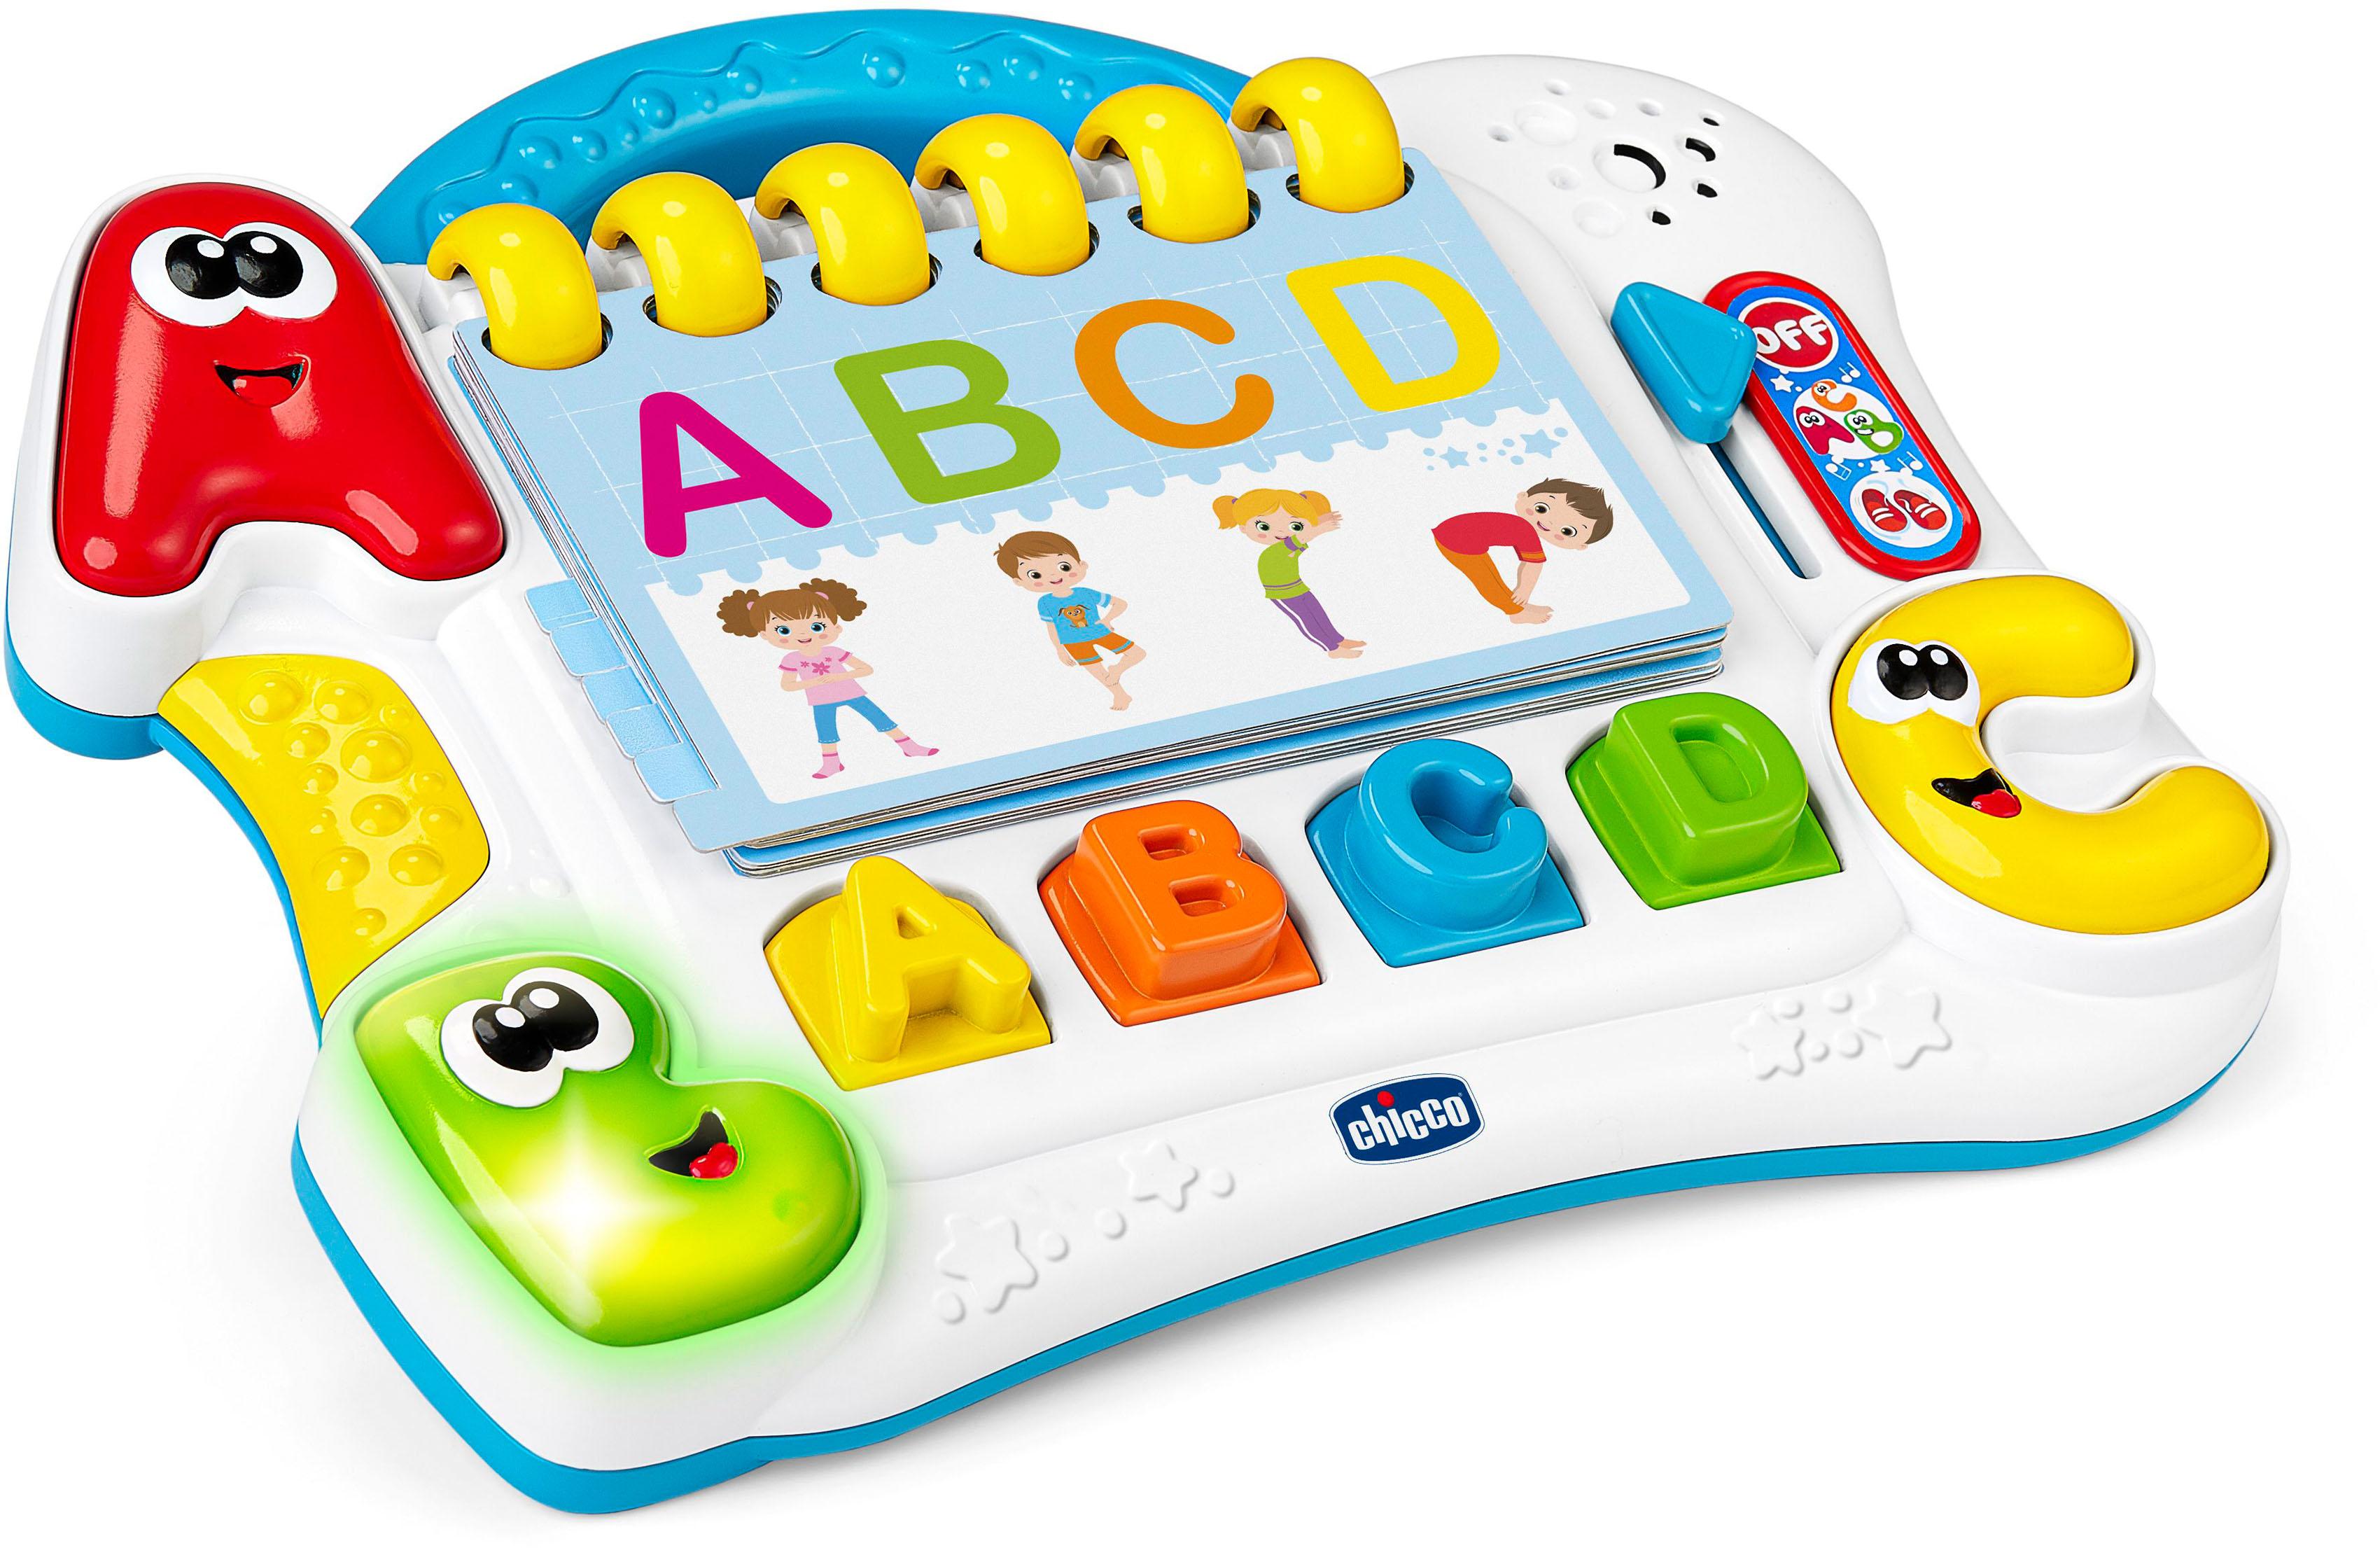 Chicco Lernspielzeug ABC Körperalphabet bunt Kinder Lernspiele